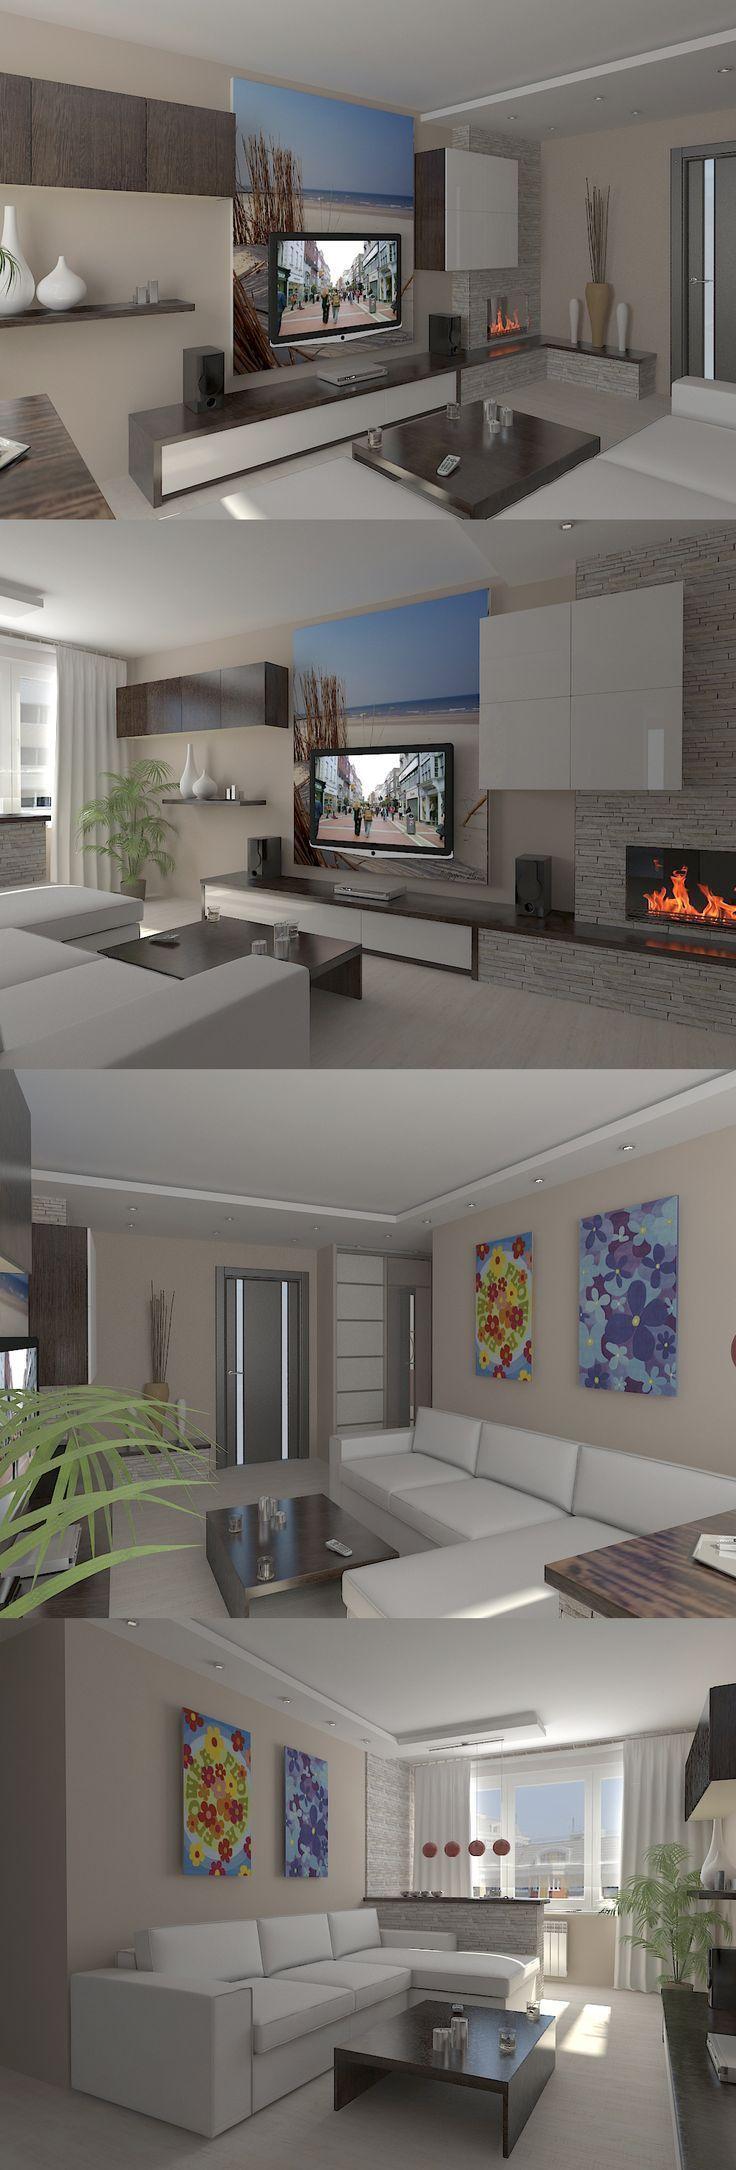 Simple small living room mens style for Minimalismus hausbau